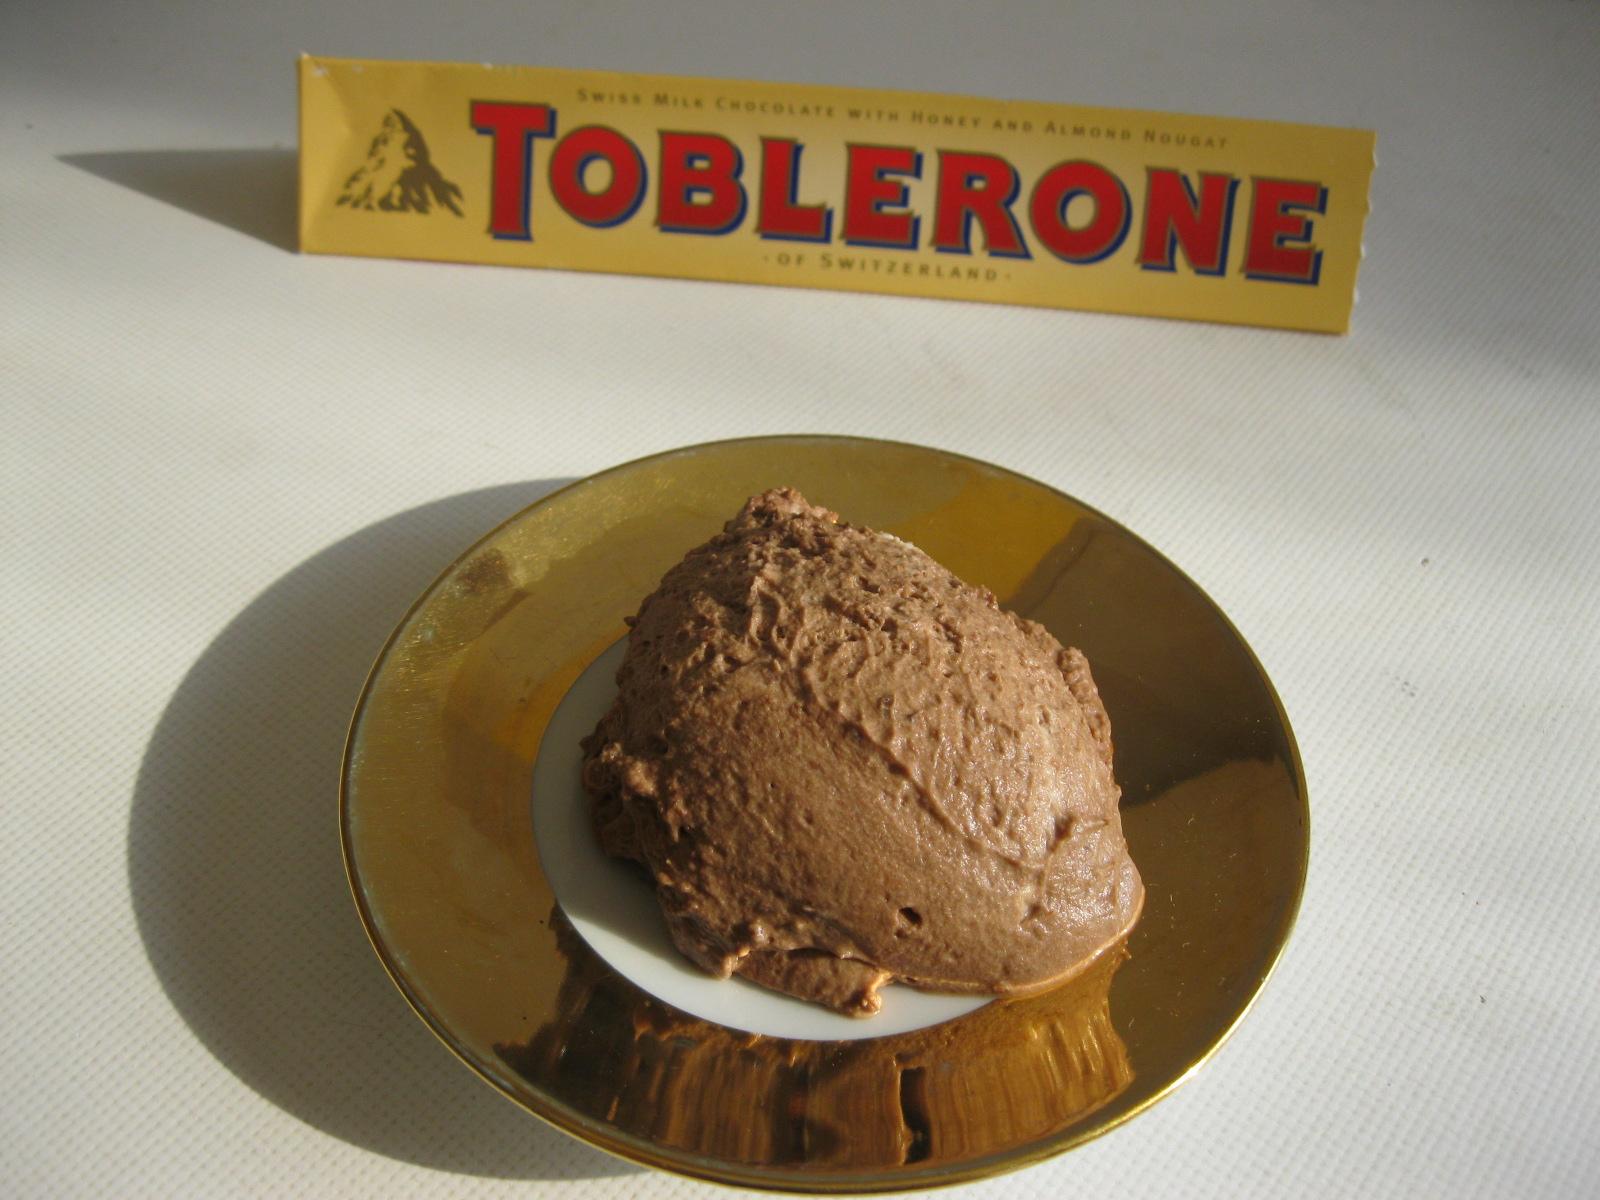 alles was schmeichelt toblerone mousse au chocolat selber machen. Black Bedroom Furniture Sets. Home Design Ideas